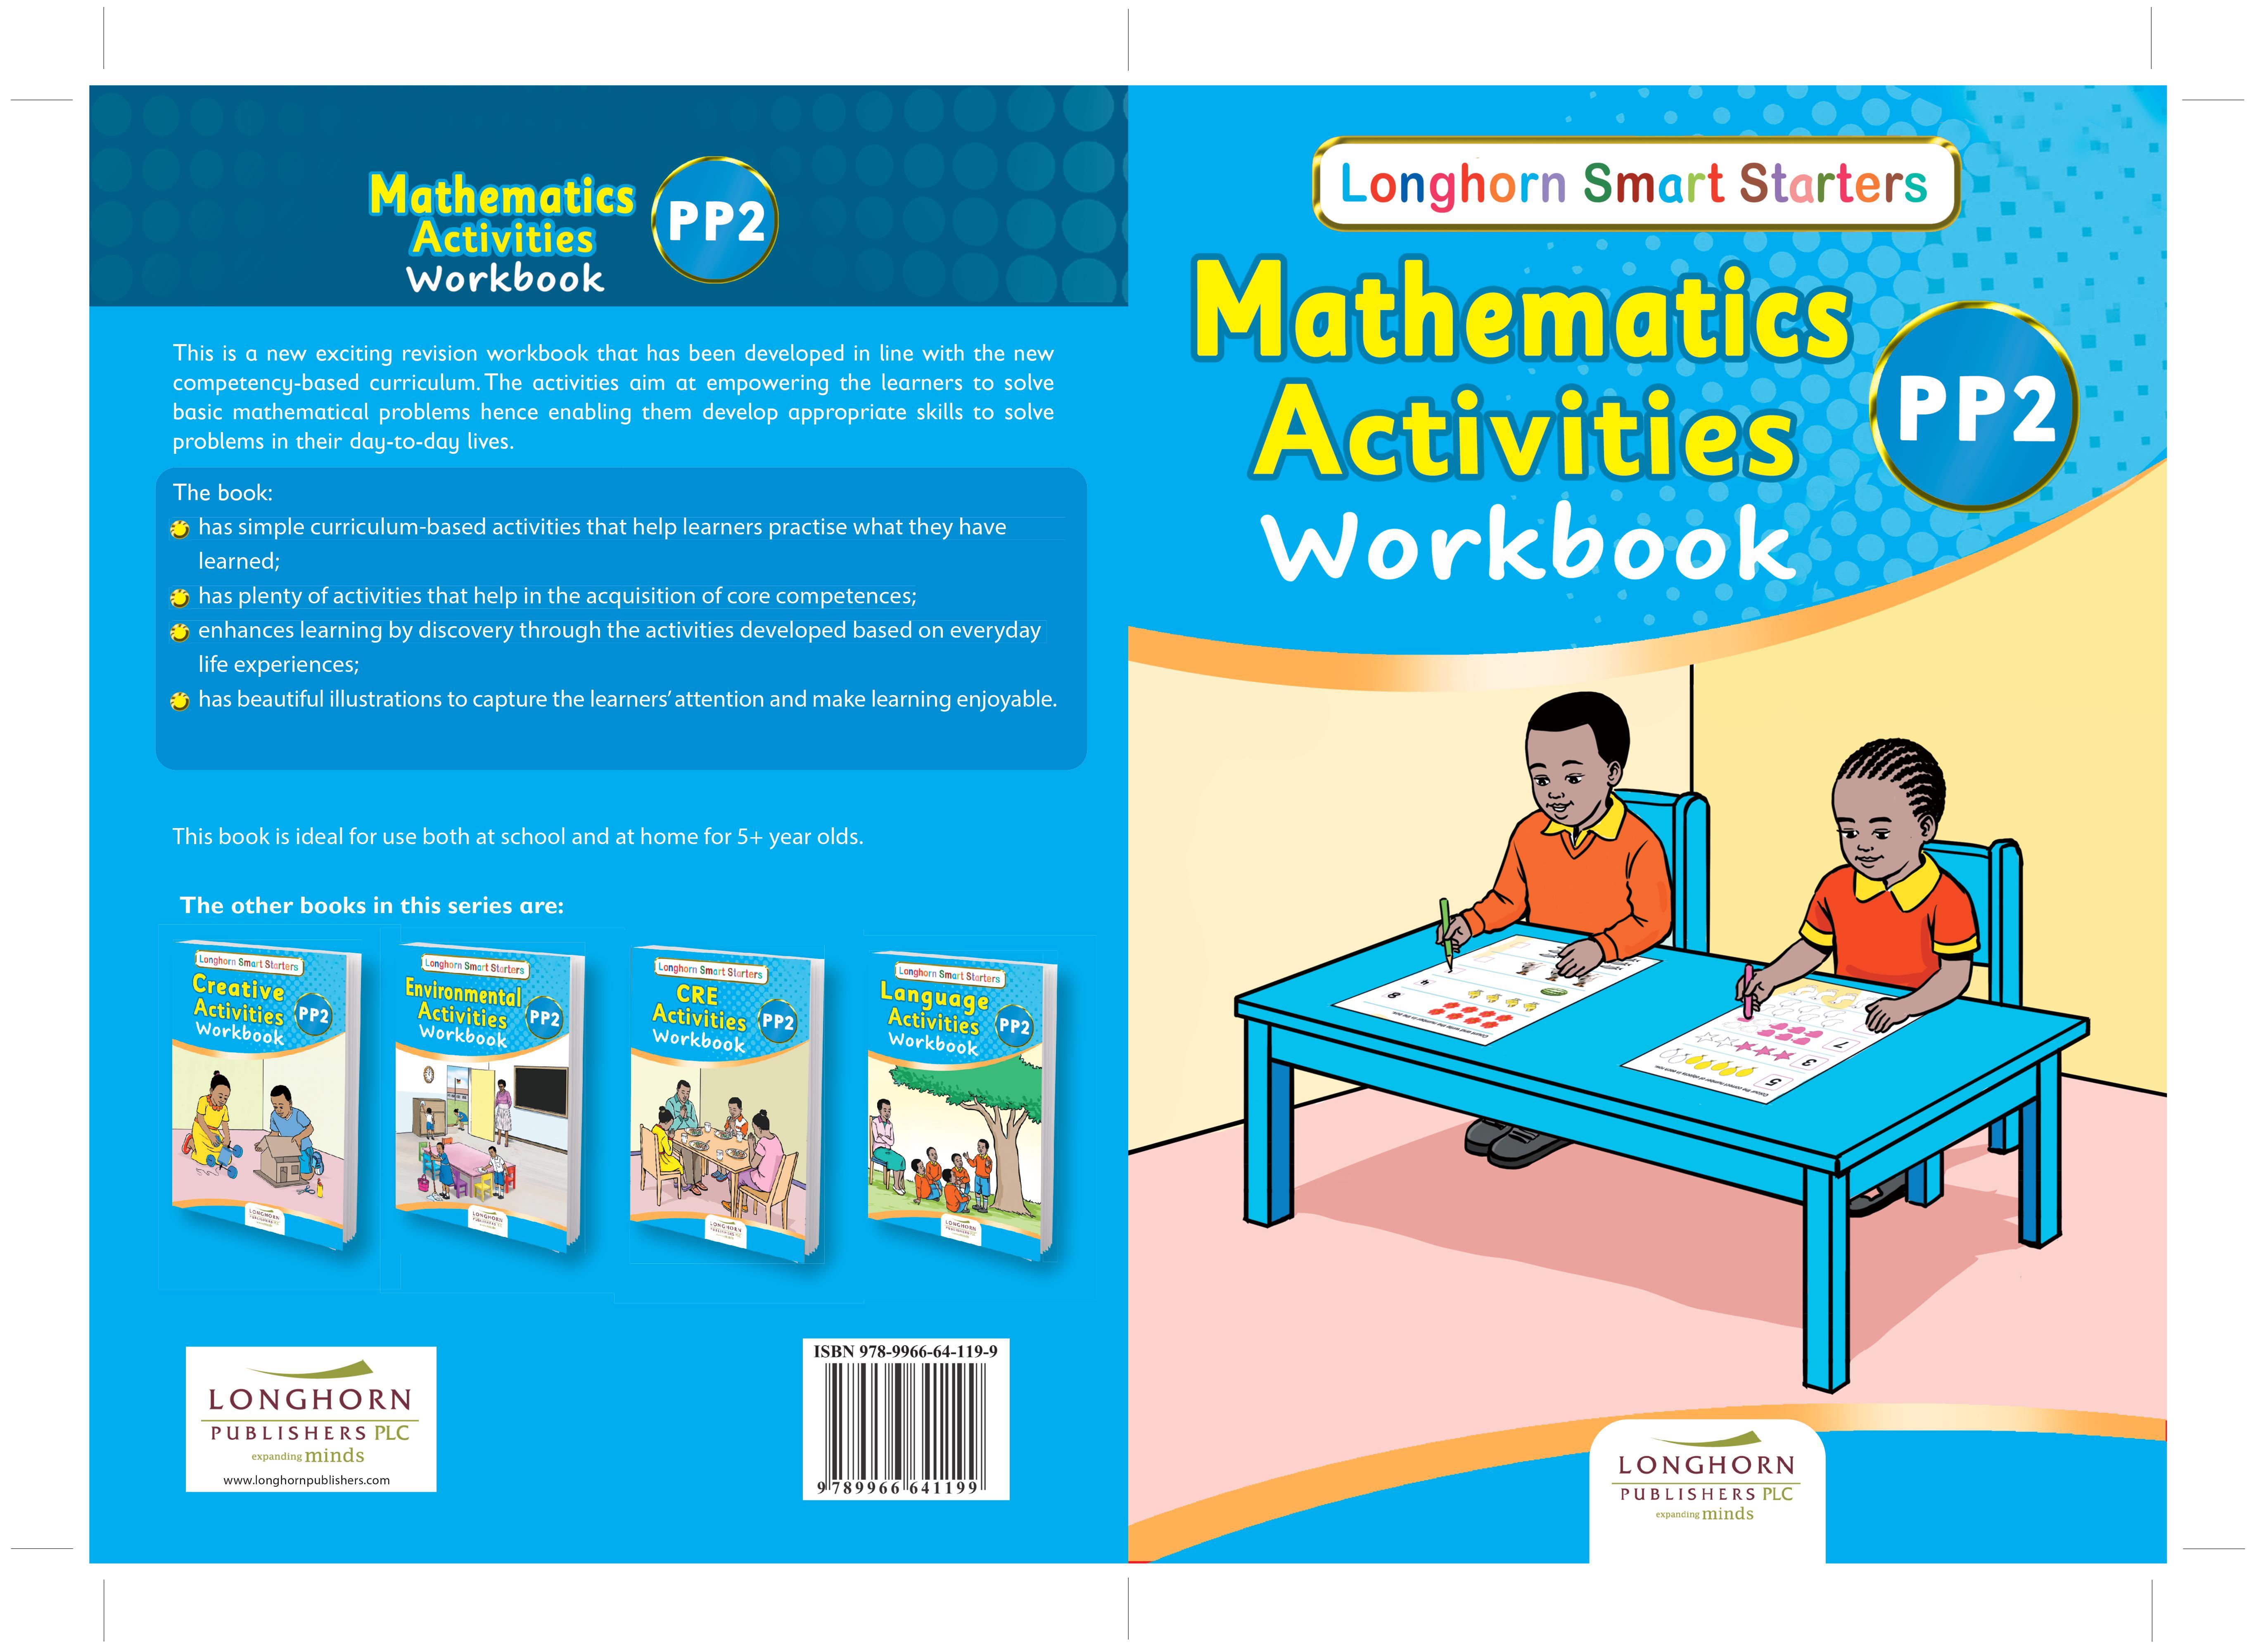 Longhorn Smart Starters Mathematics Activities Workbook PP2